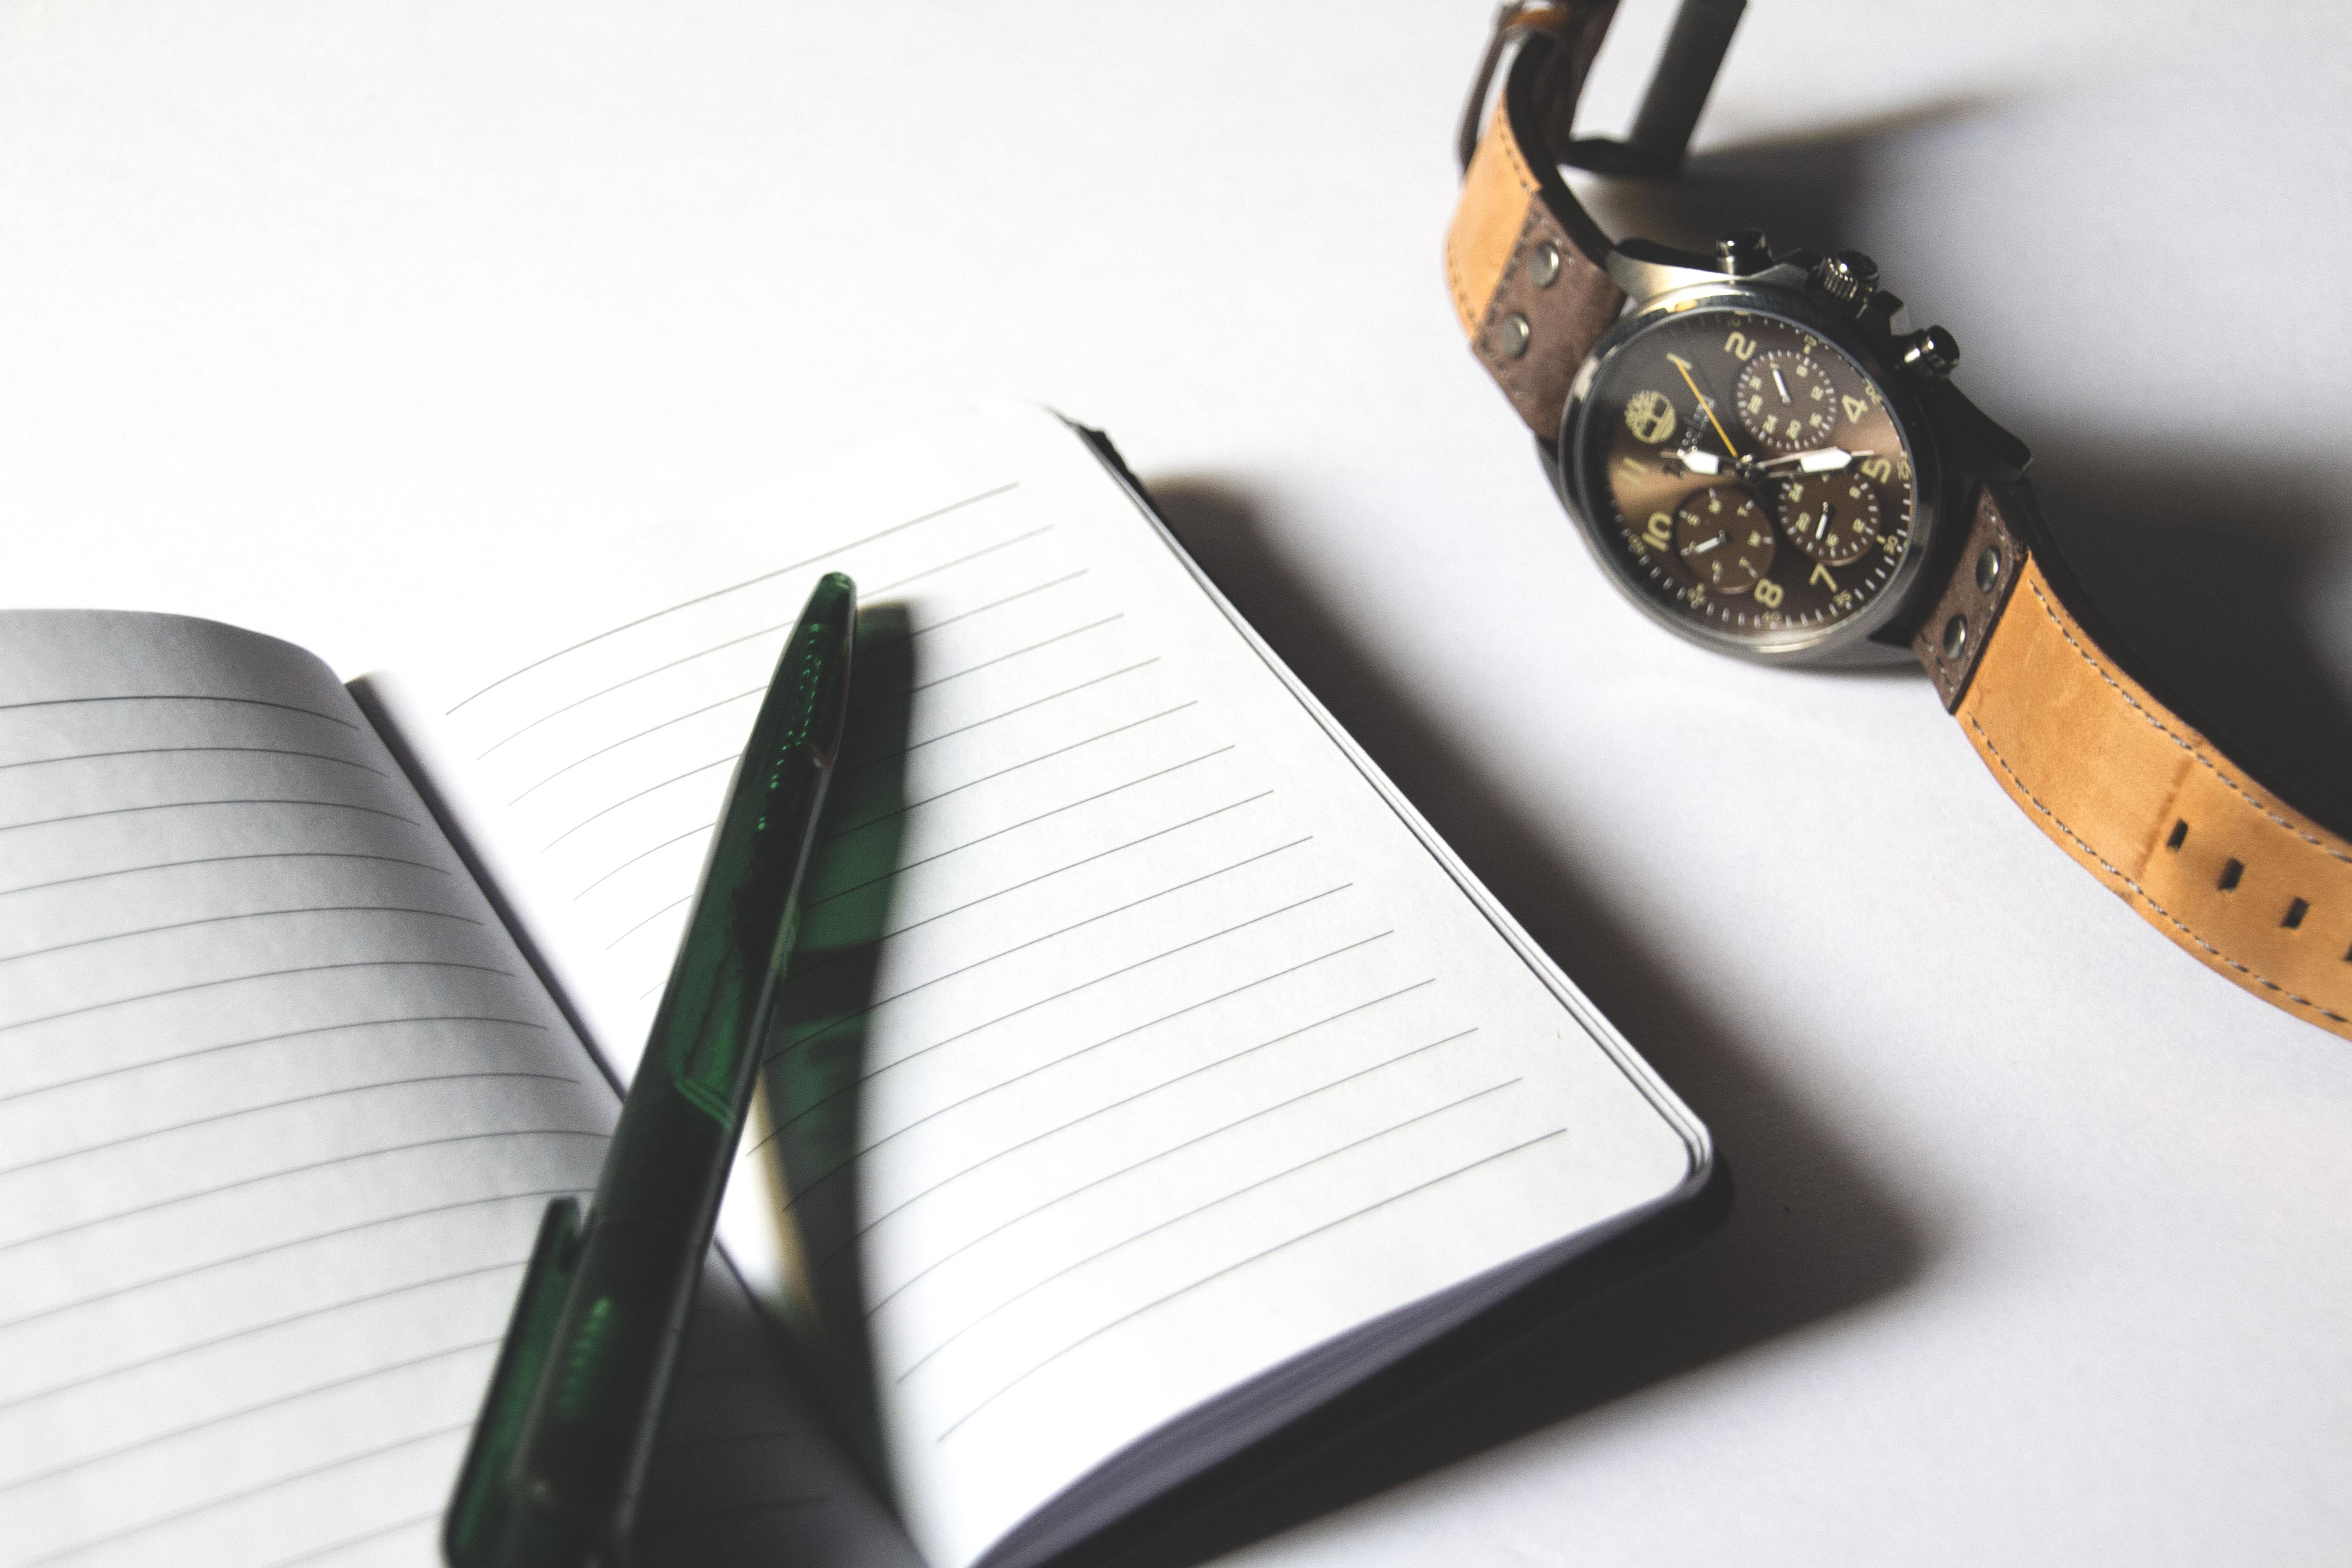 Click Pen on Notebook Beside Chronograph Watch